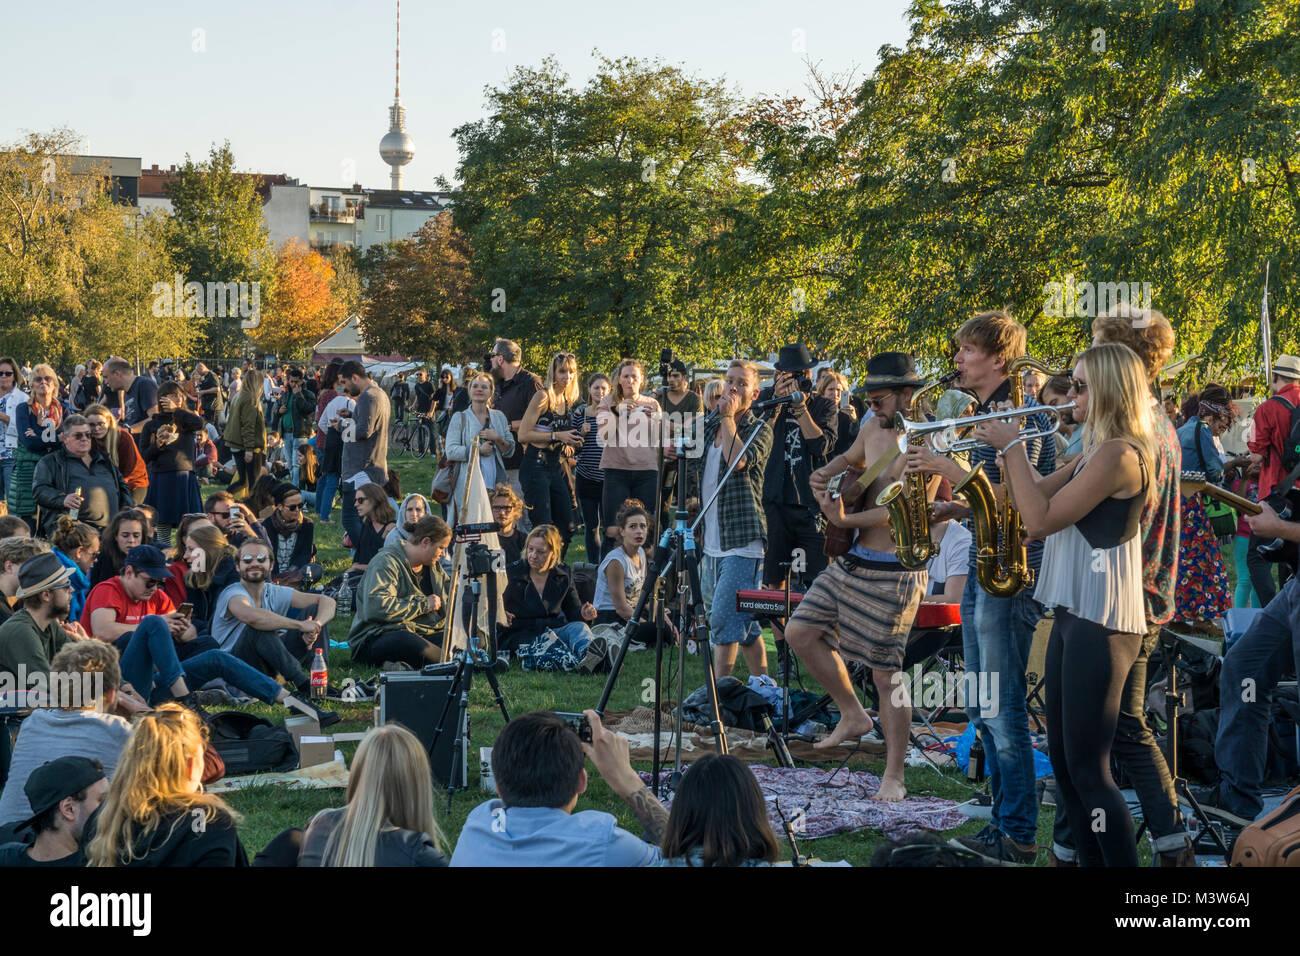 Live Band , Mauerpark, Prenzlauer Berg, Berlin  | crowd listening to live music , Mauerpark, Prenzlauer Berg, Berlin - Stock Image